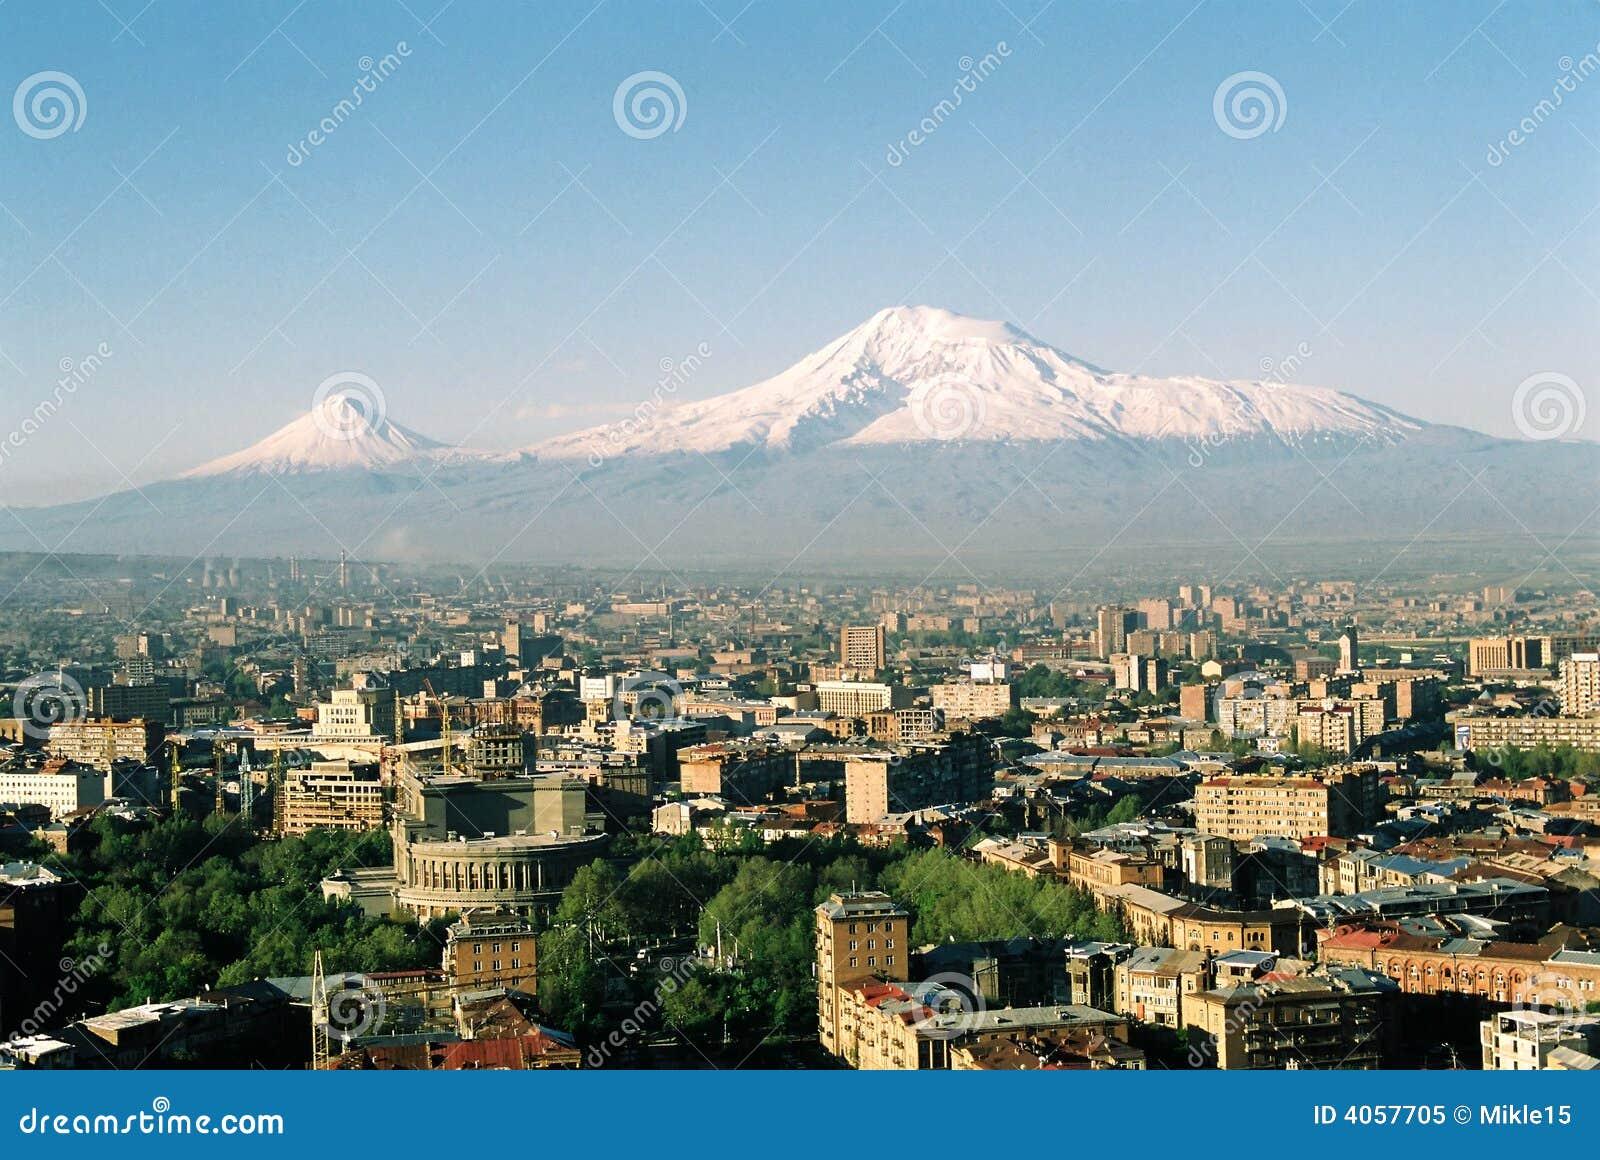 Ararat armenia mt yerevan